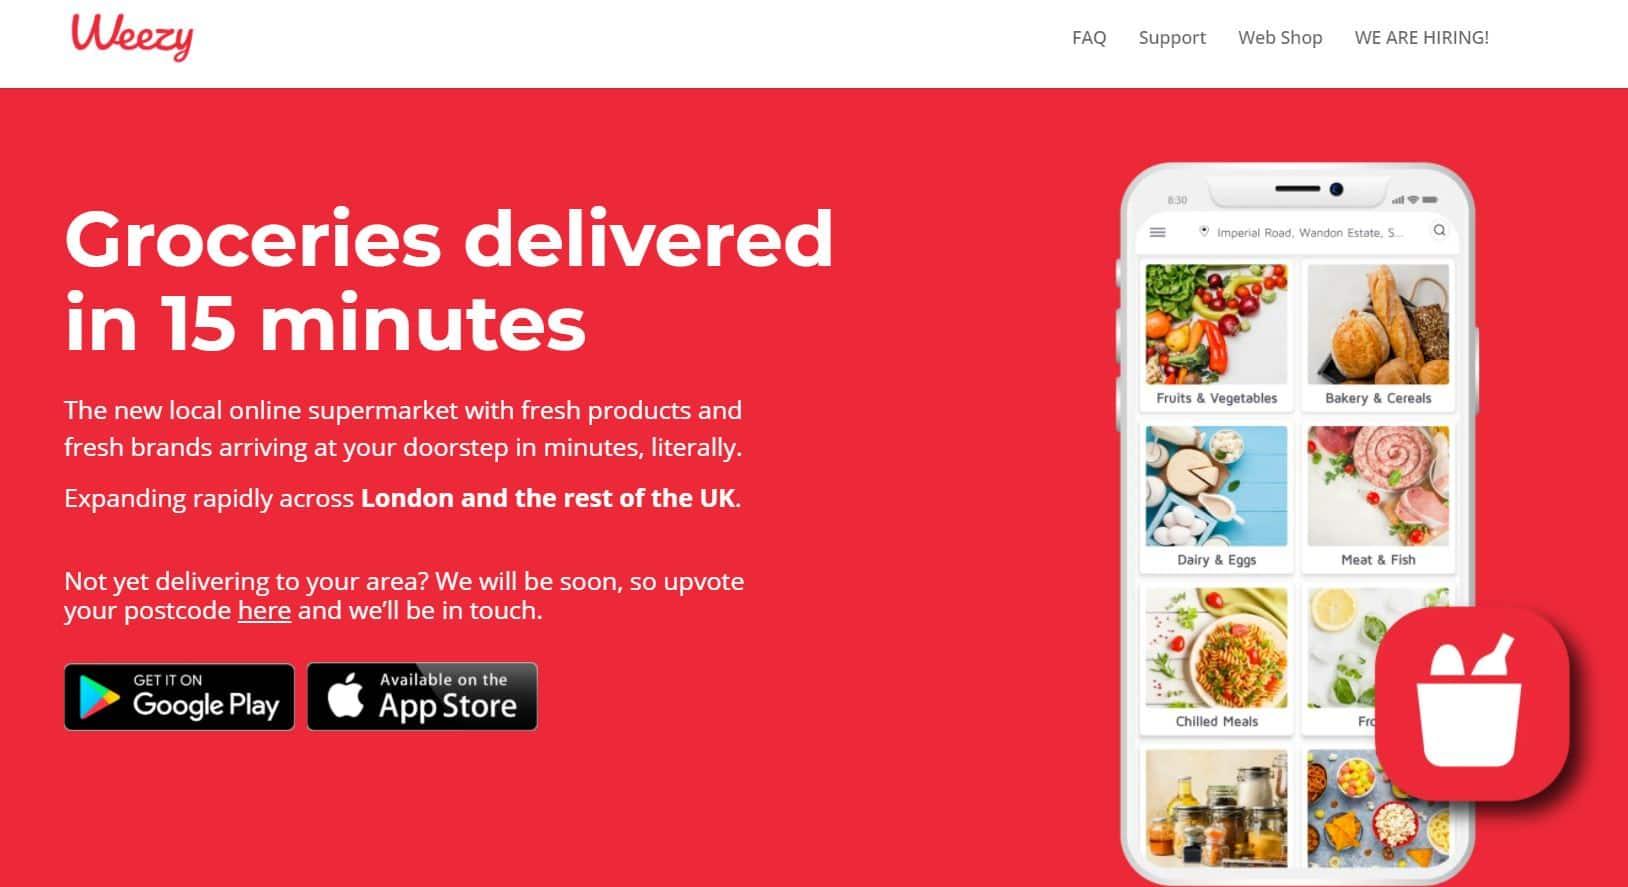 Weezy - 15 minutes supermarket aus London